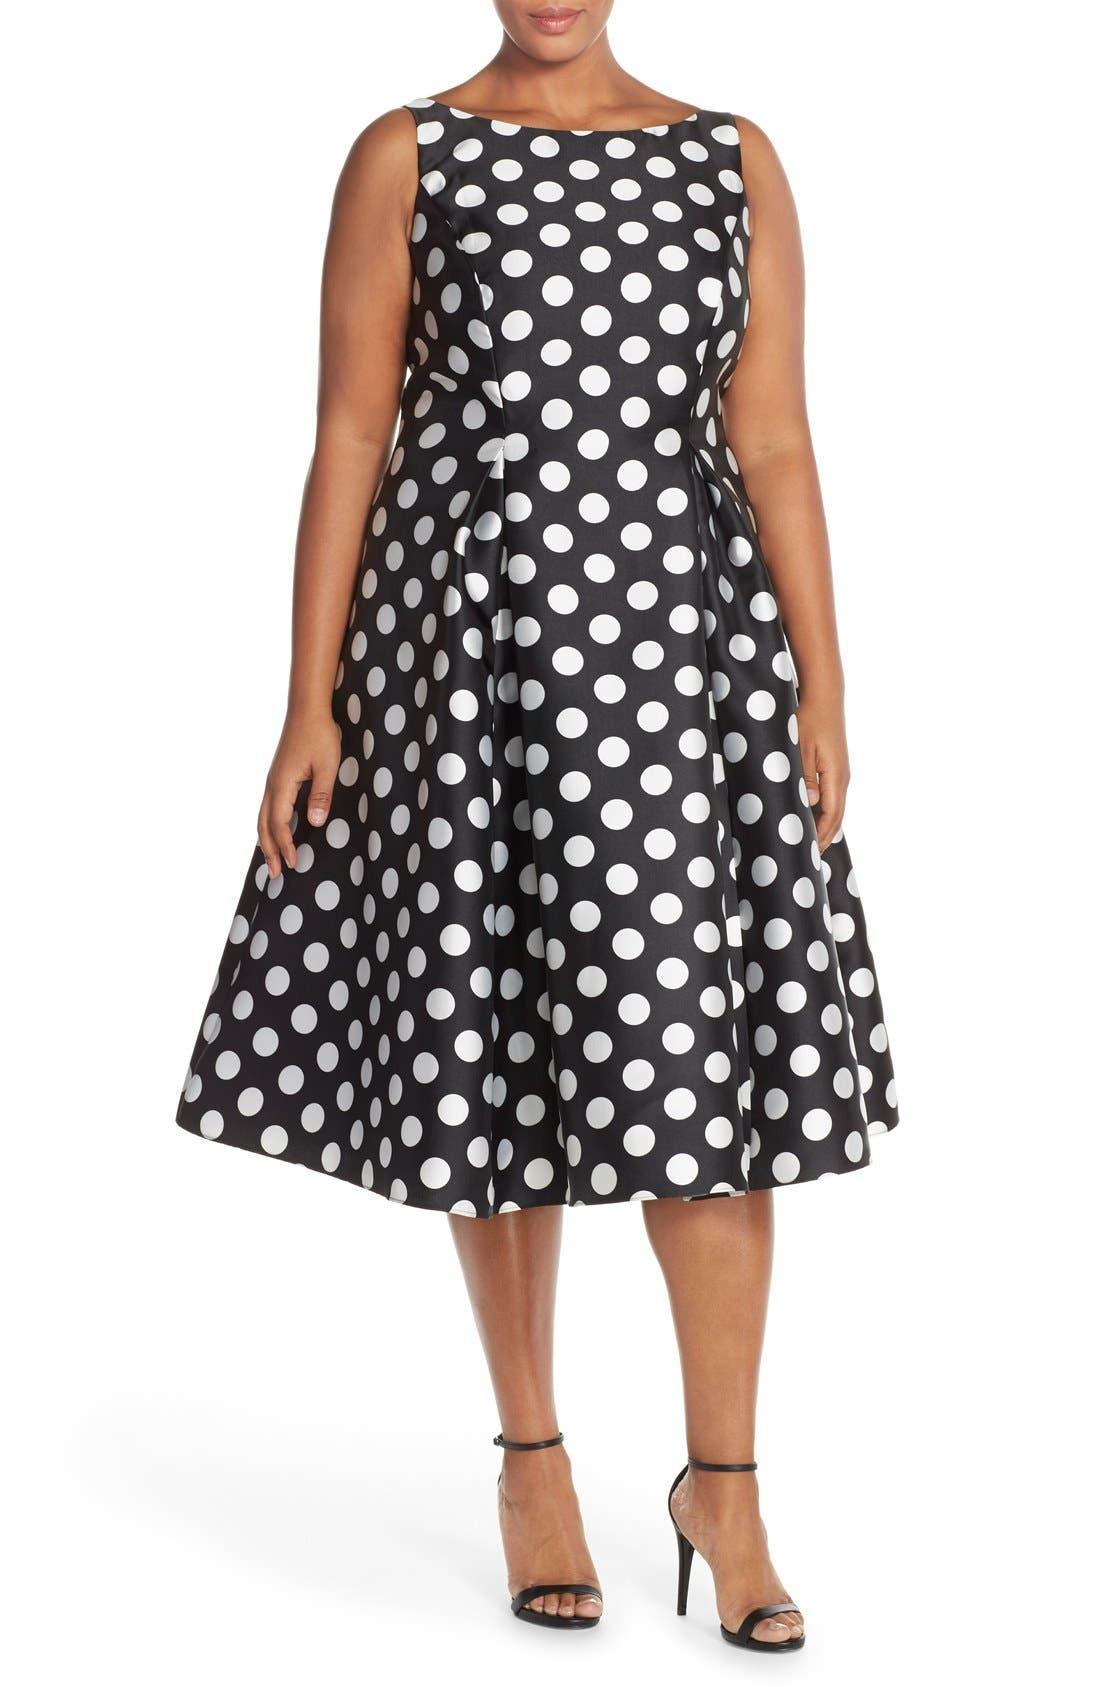 Main Image - Adrianna Papell Sleeveless Mikado Fit & Flare Polka Dot Midi Dress (Plus Size)